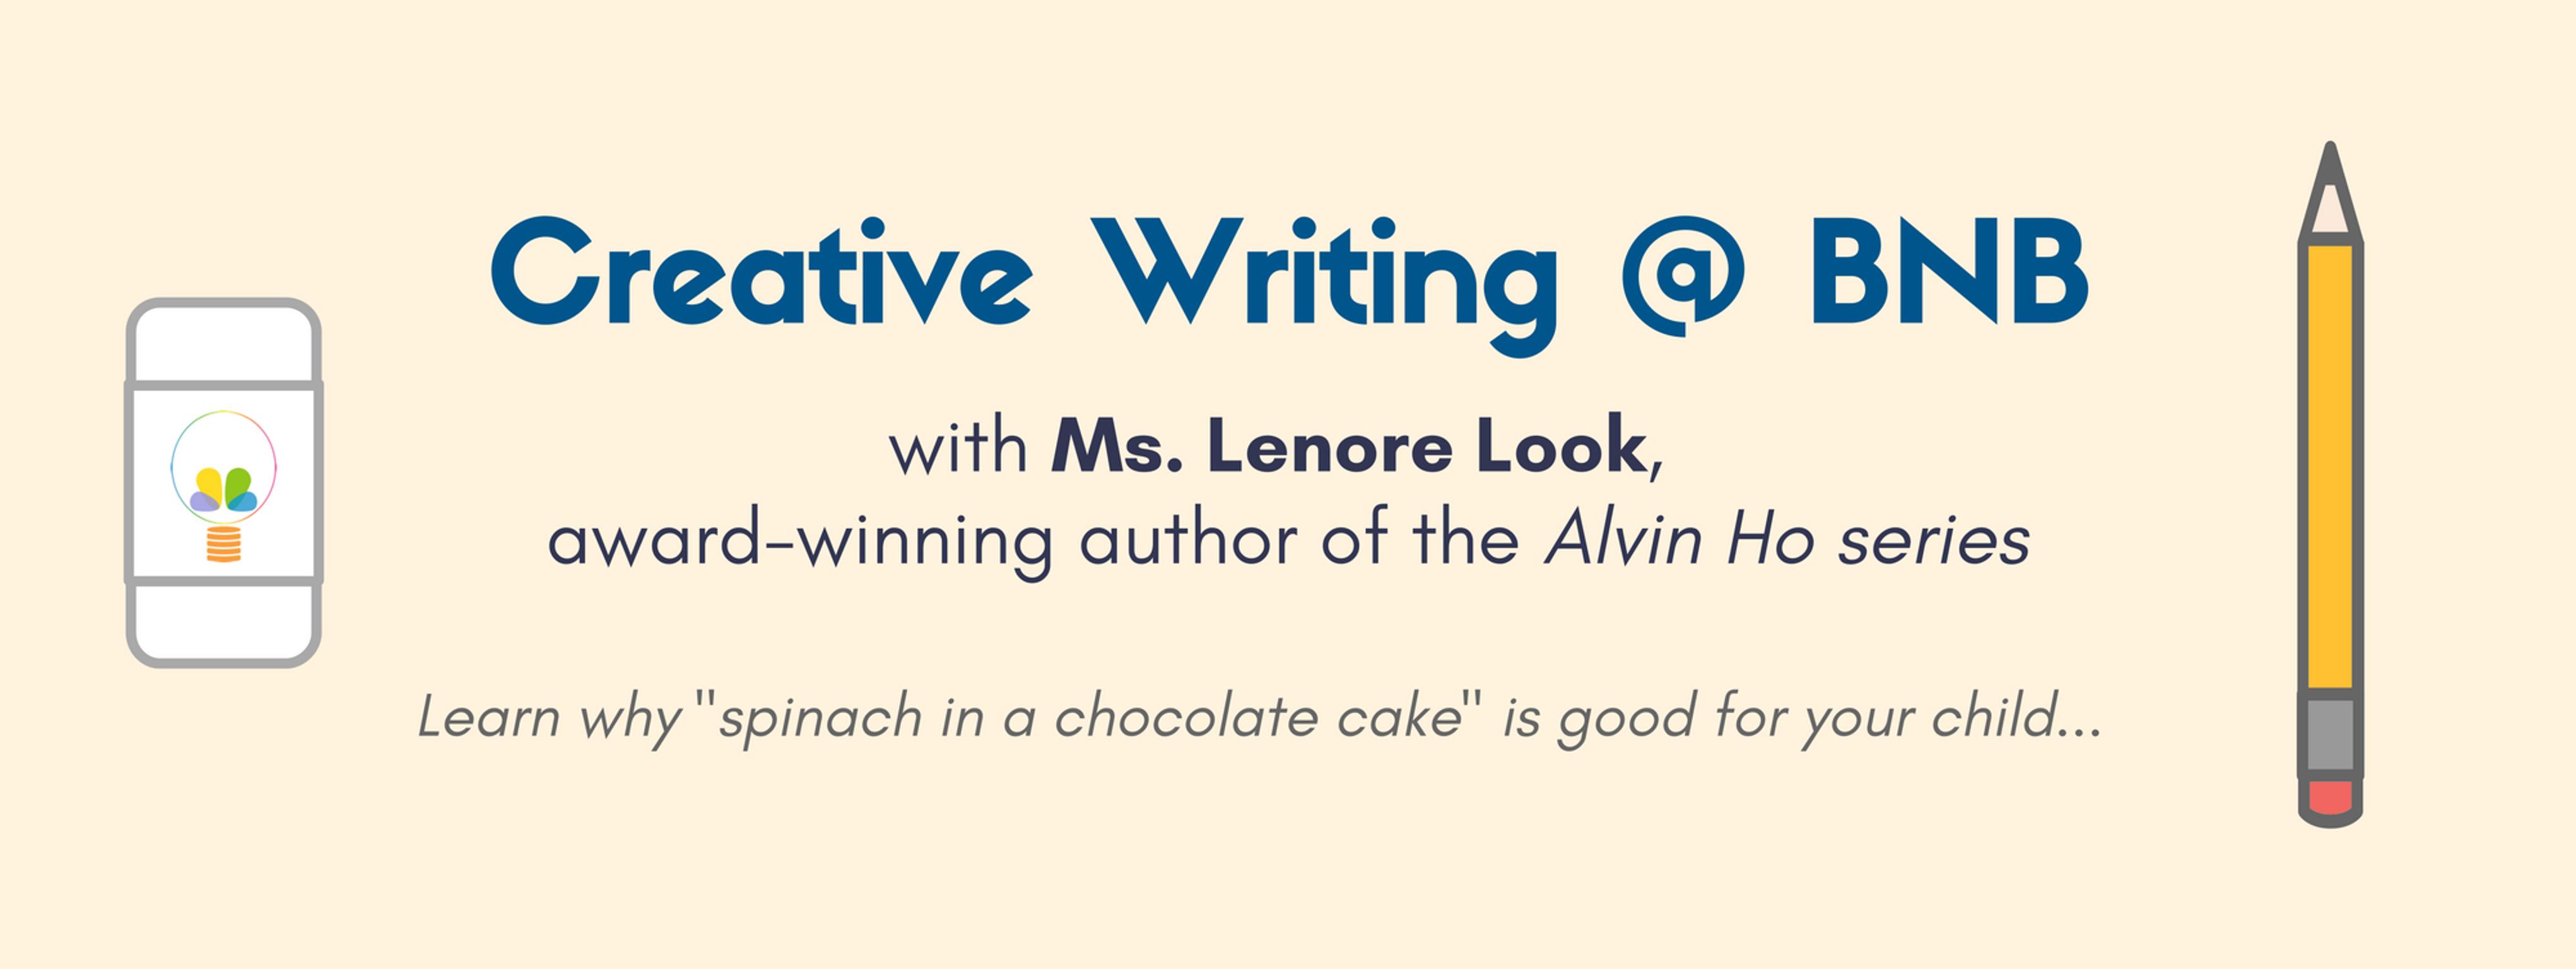 Creative writing.com free dissertations online